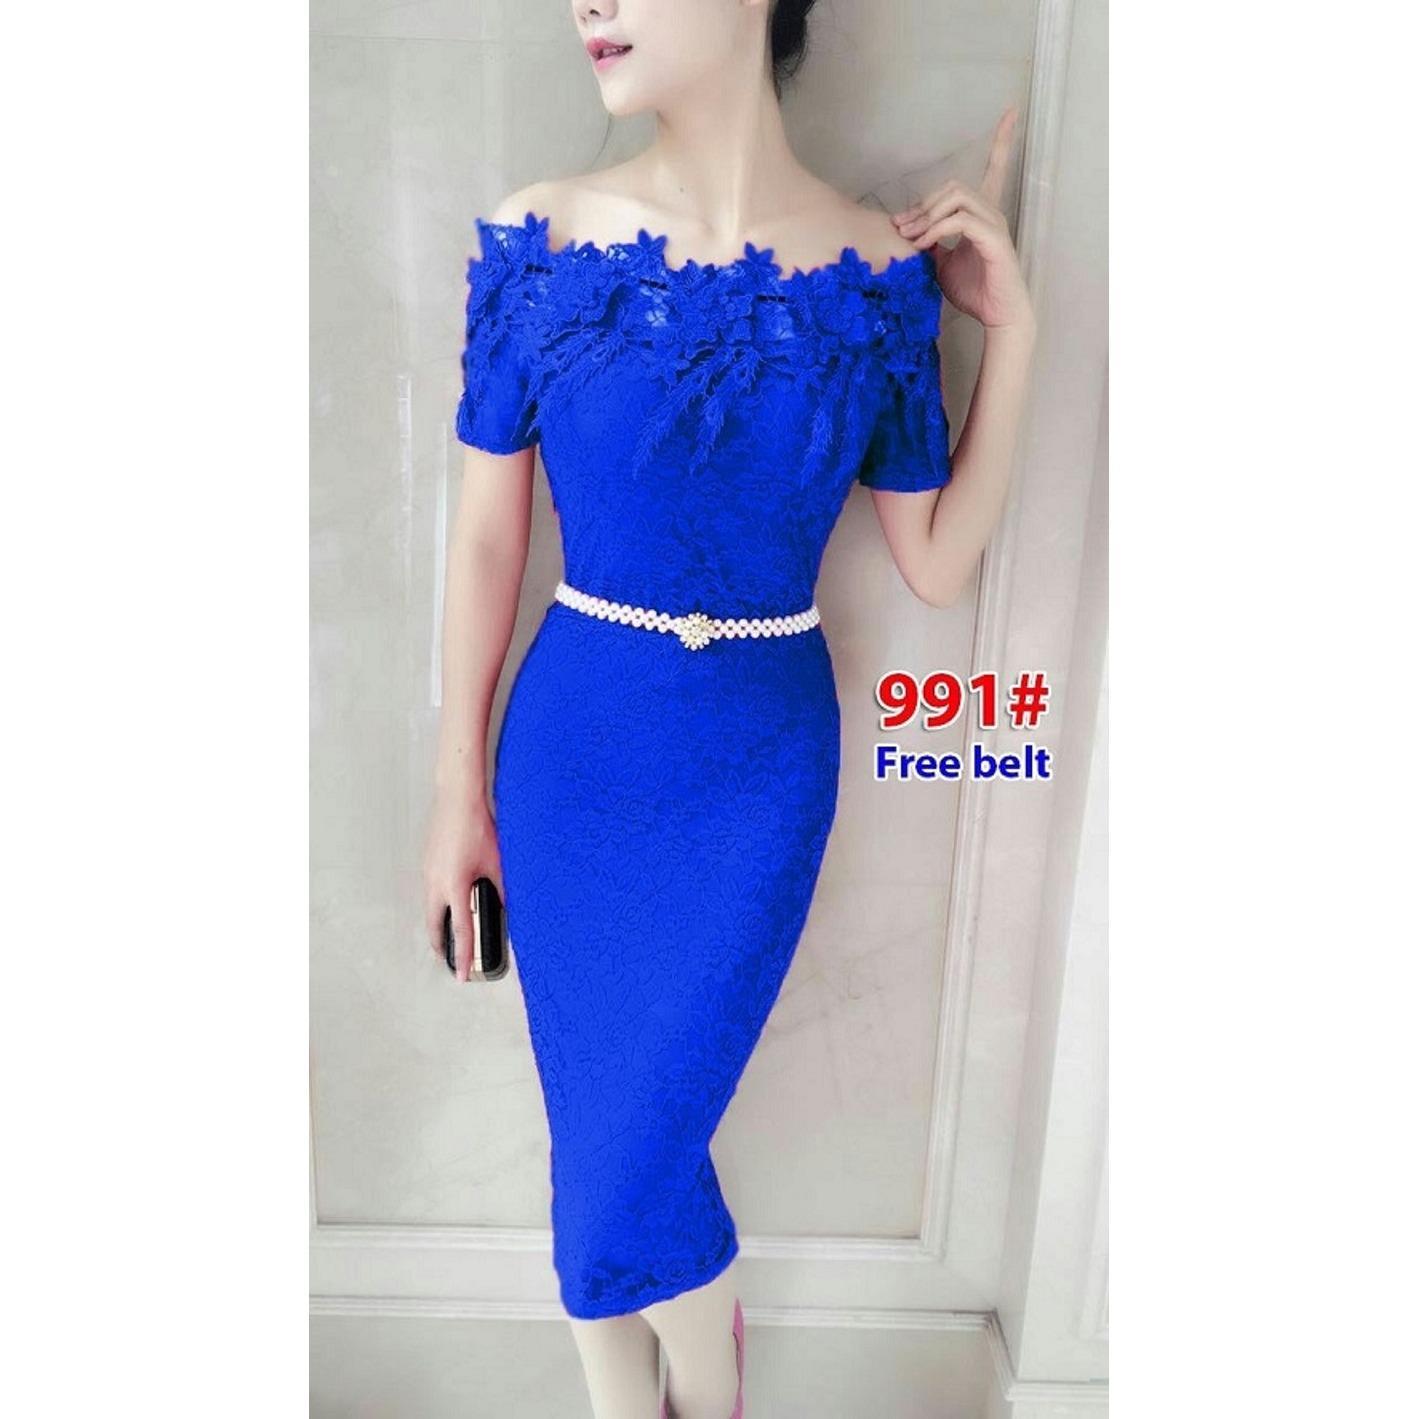 GSD -Baju Wanita /Gaun Pesta /Baju Pesta /Minidress /Dress Brukat /Dress Import 991